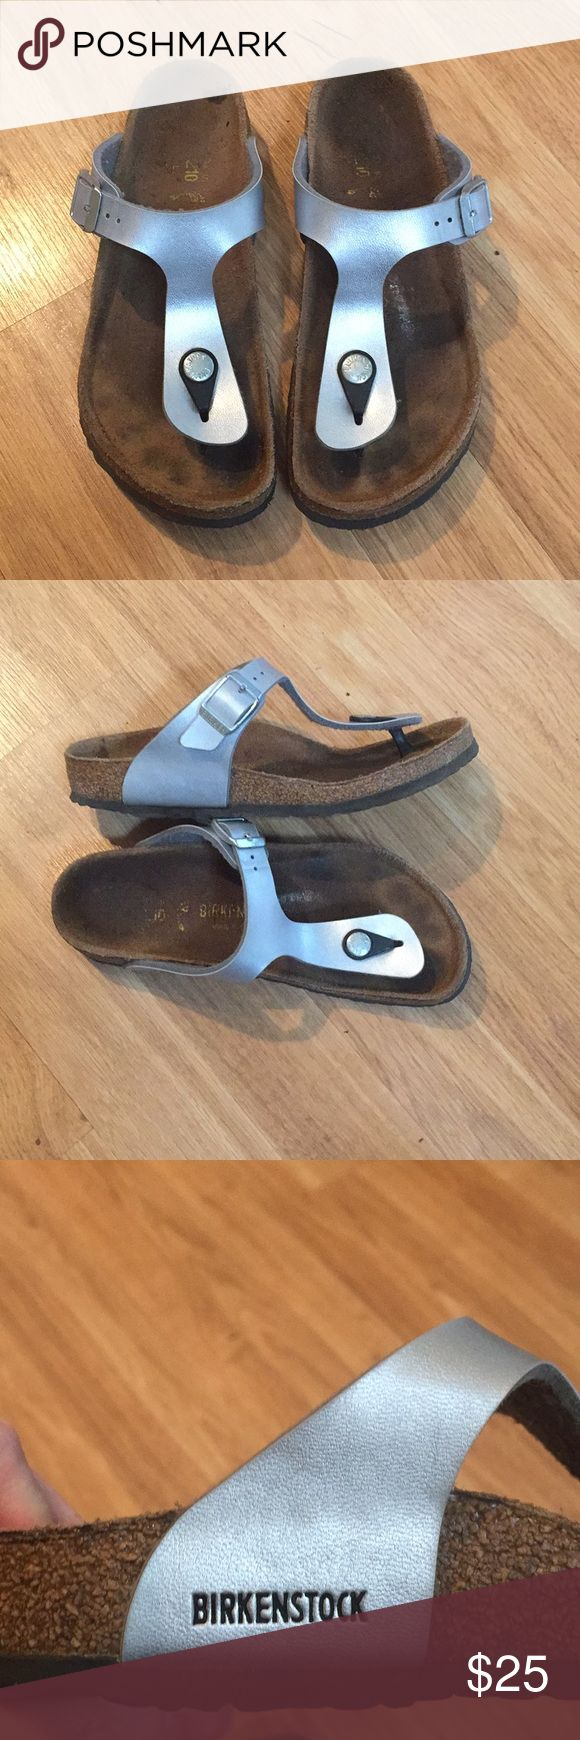 Kids Birkenstock Sandal Great kids thong  Birkenstock with adjustable buckle strap. Style- Gizeh, Silver, Size 33/2-2.5 Signs of normal wear, soles in great shape. Stain on one shoe see photo. Birkenstock Shoes Sandals & Flip Flops